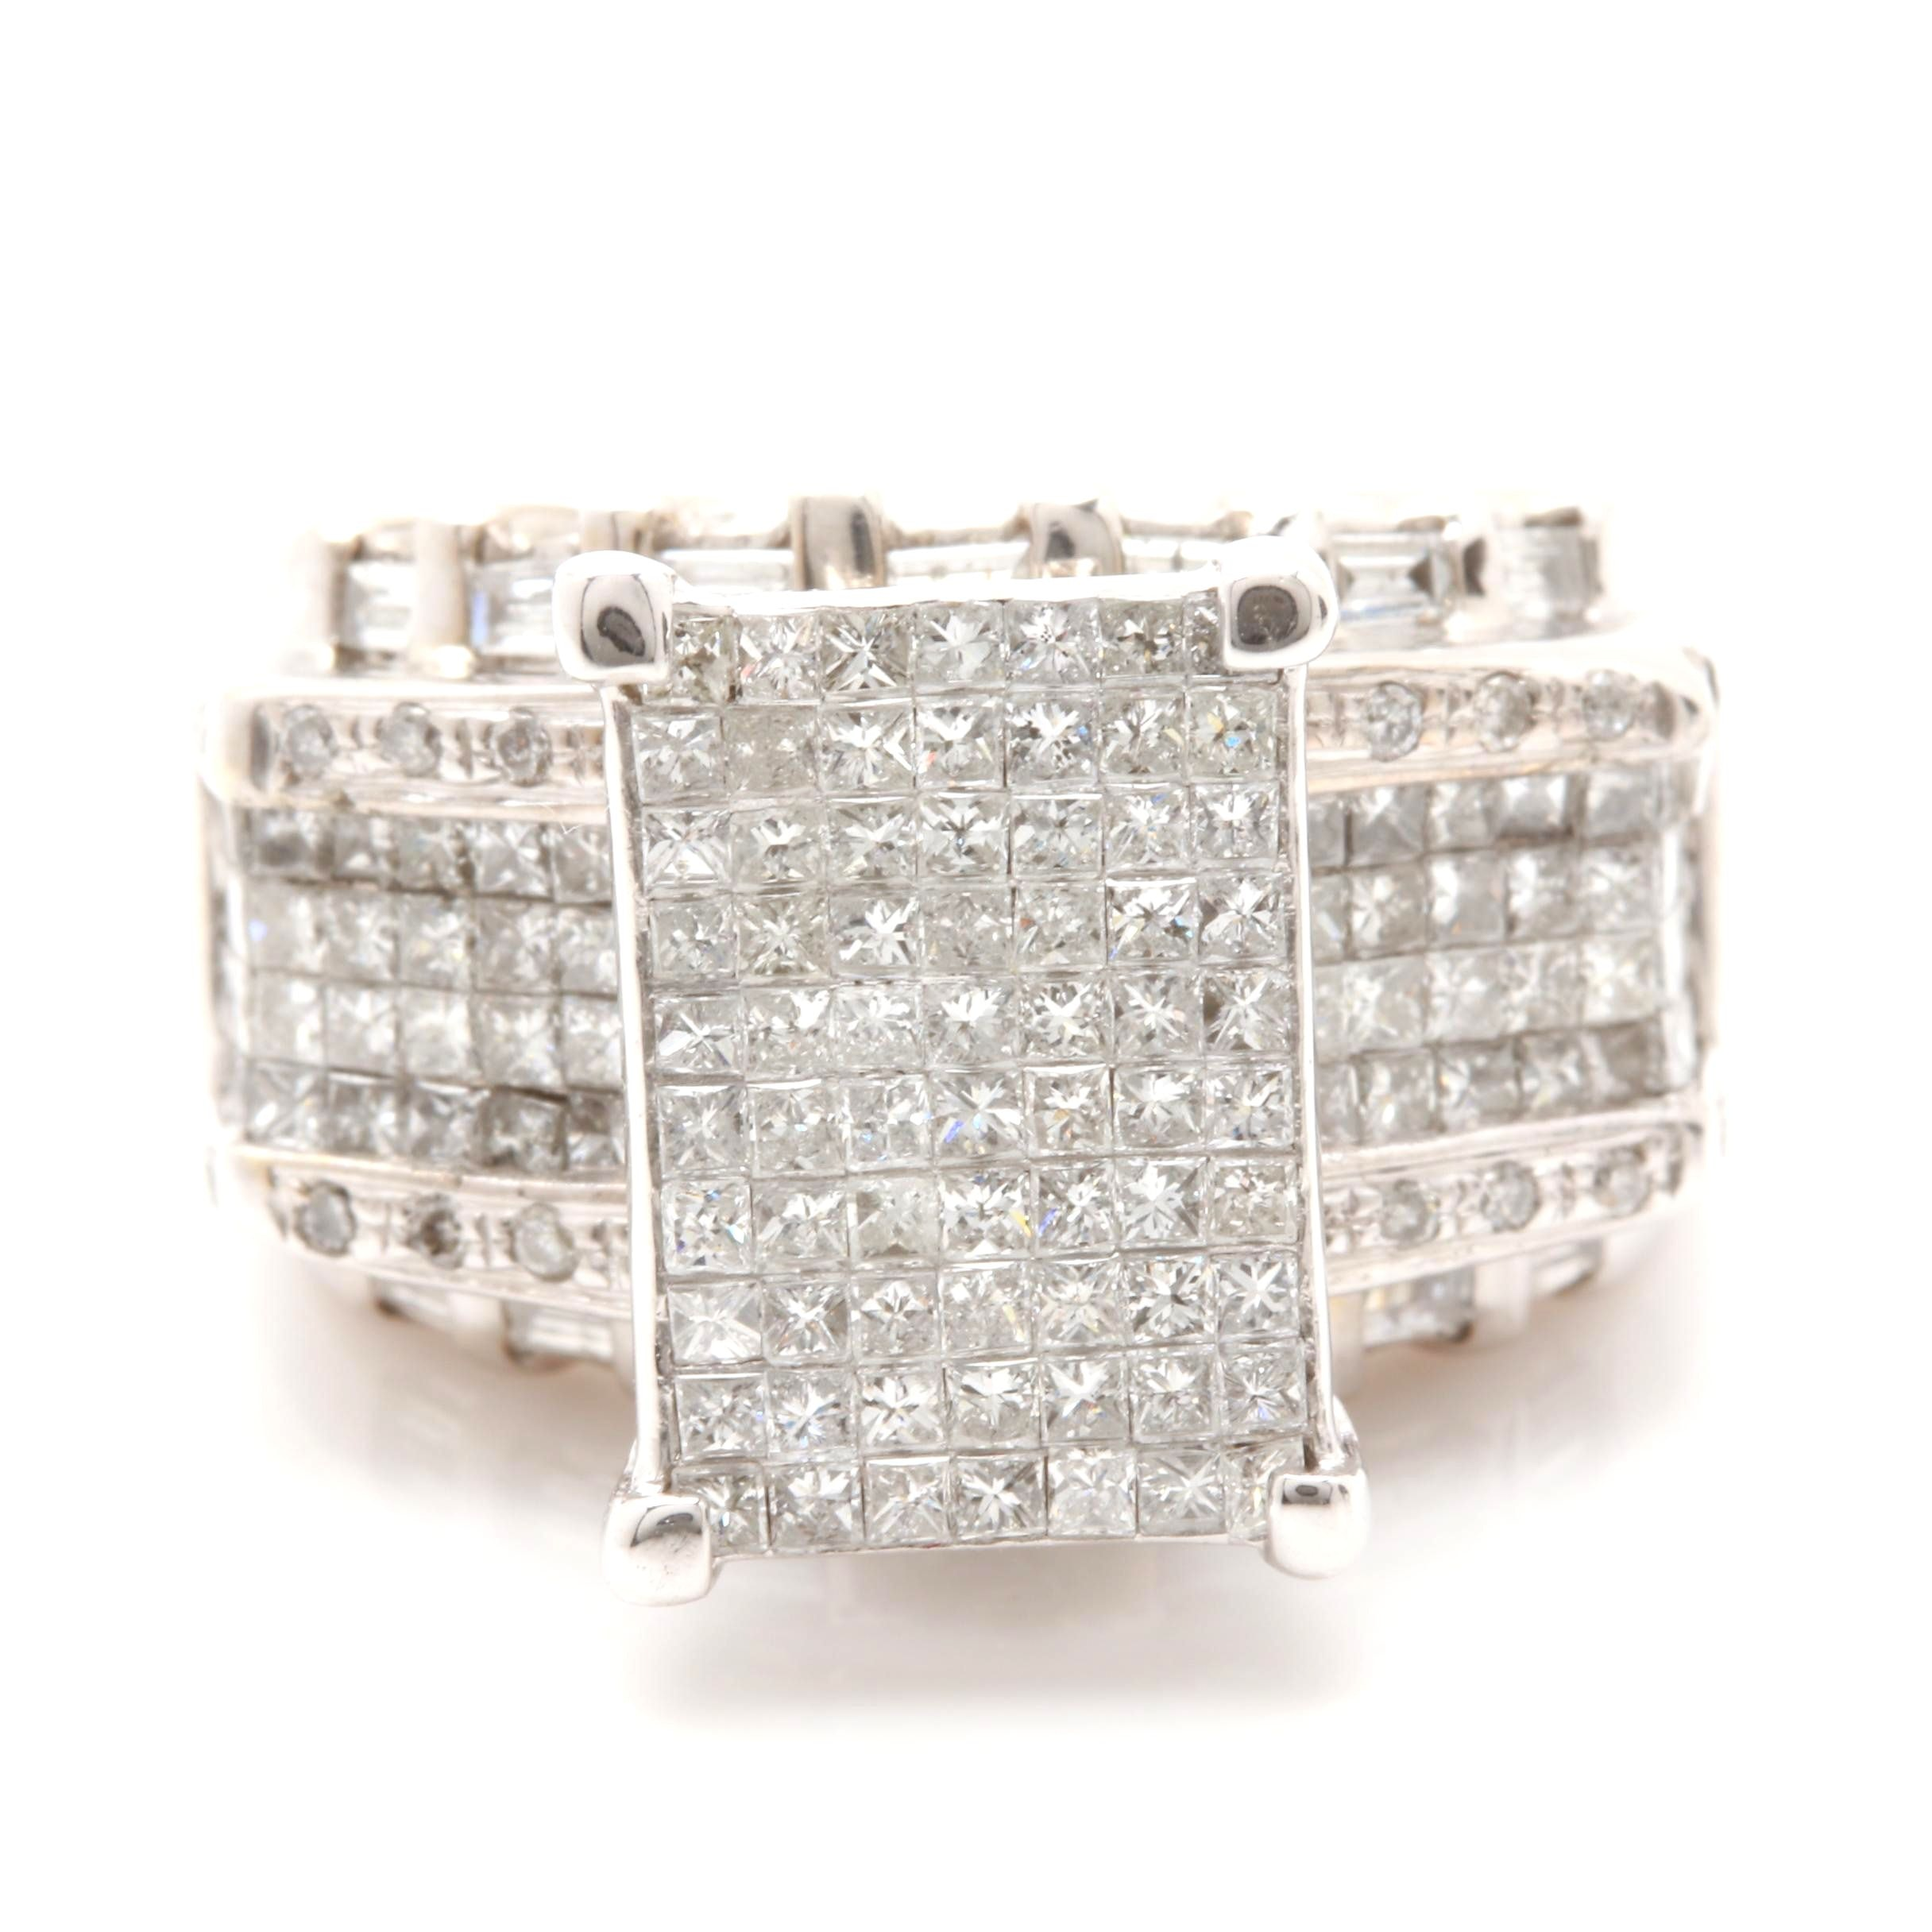 14K White Gold 2.16 CTW Diamond Ring